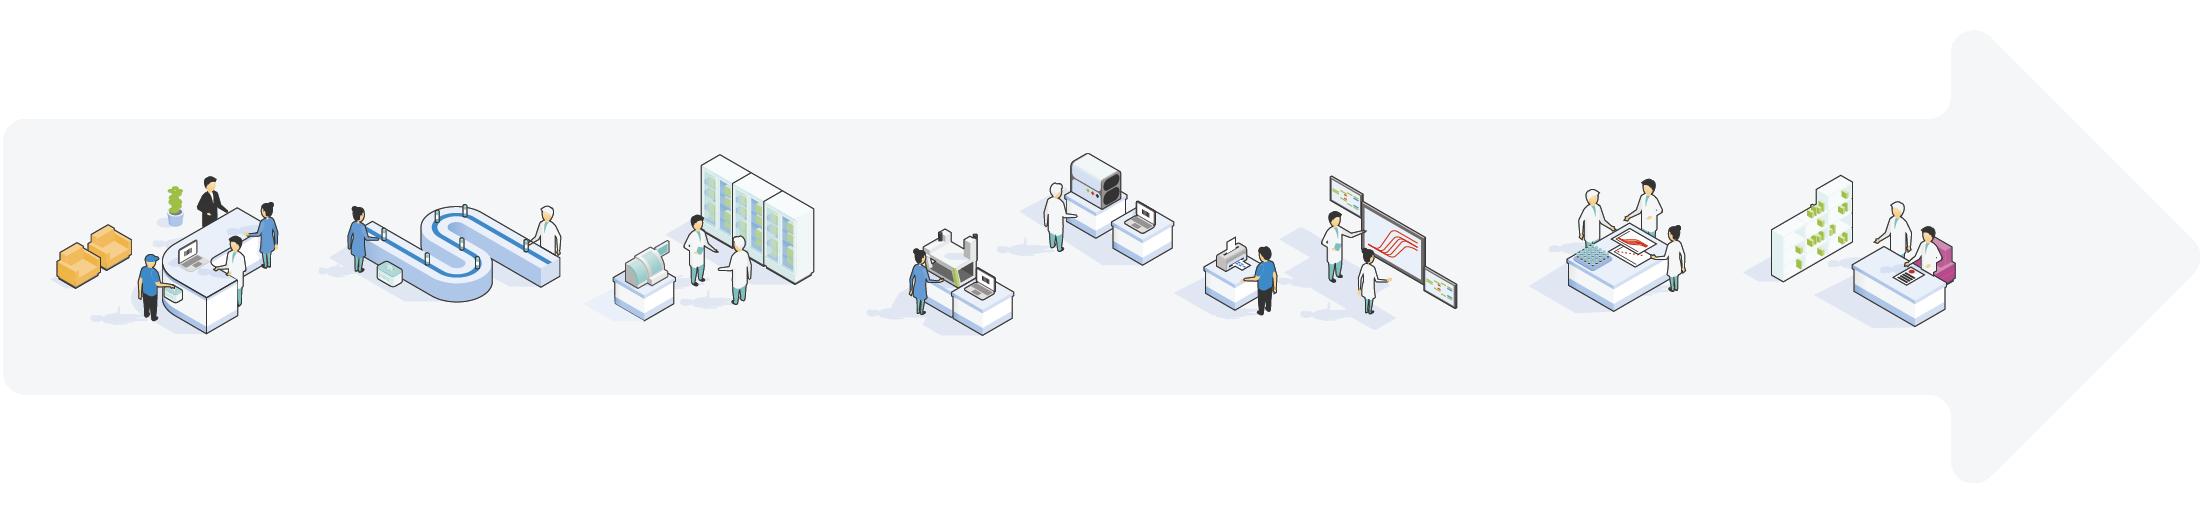 Rect-graphic-platform-visual-no-software@2x